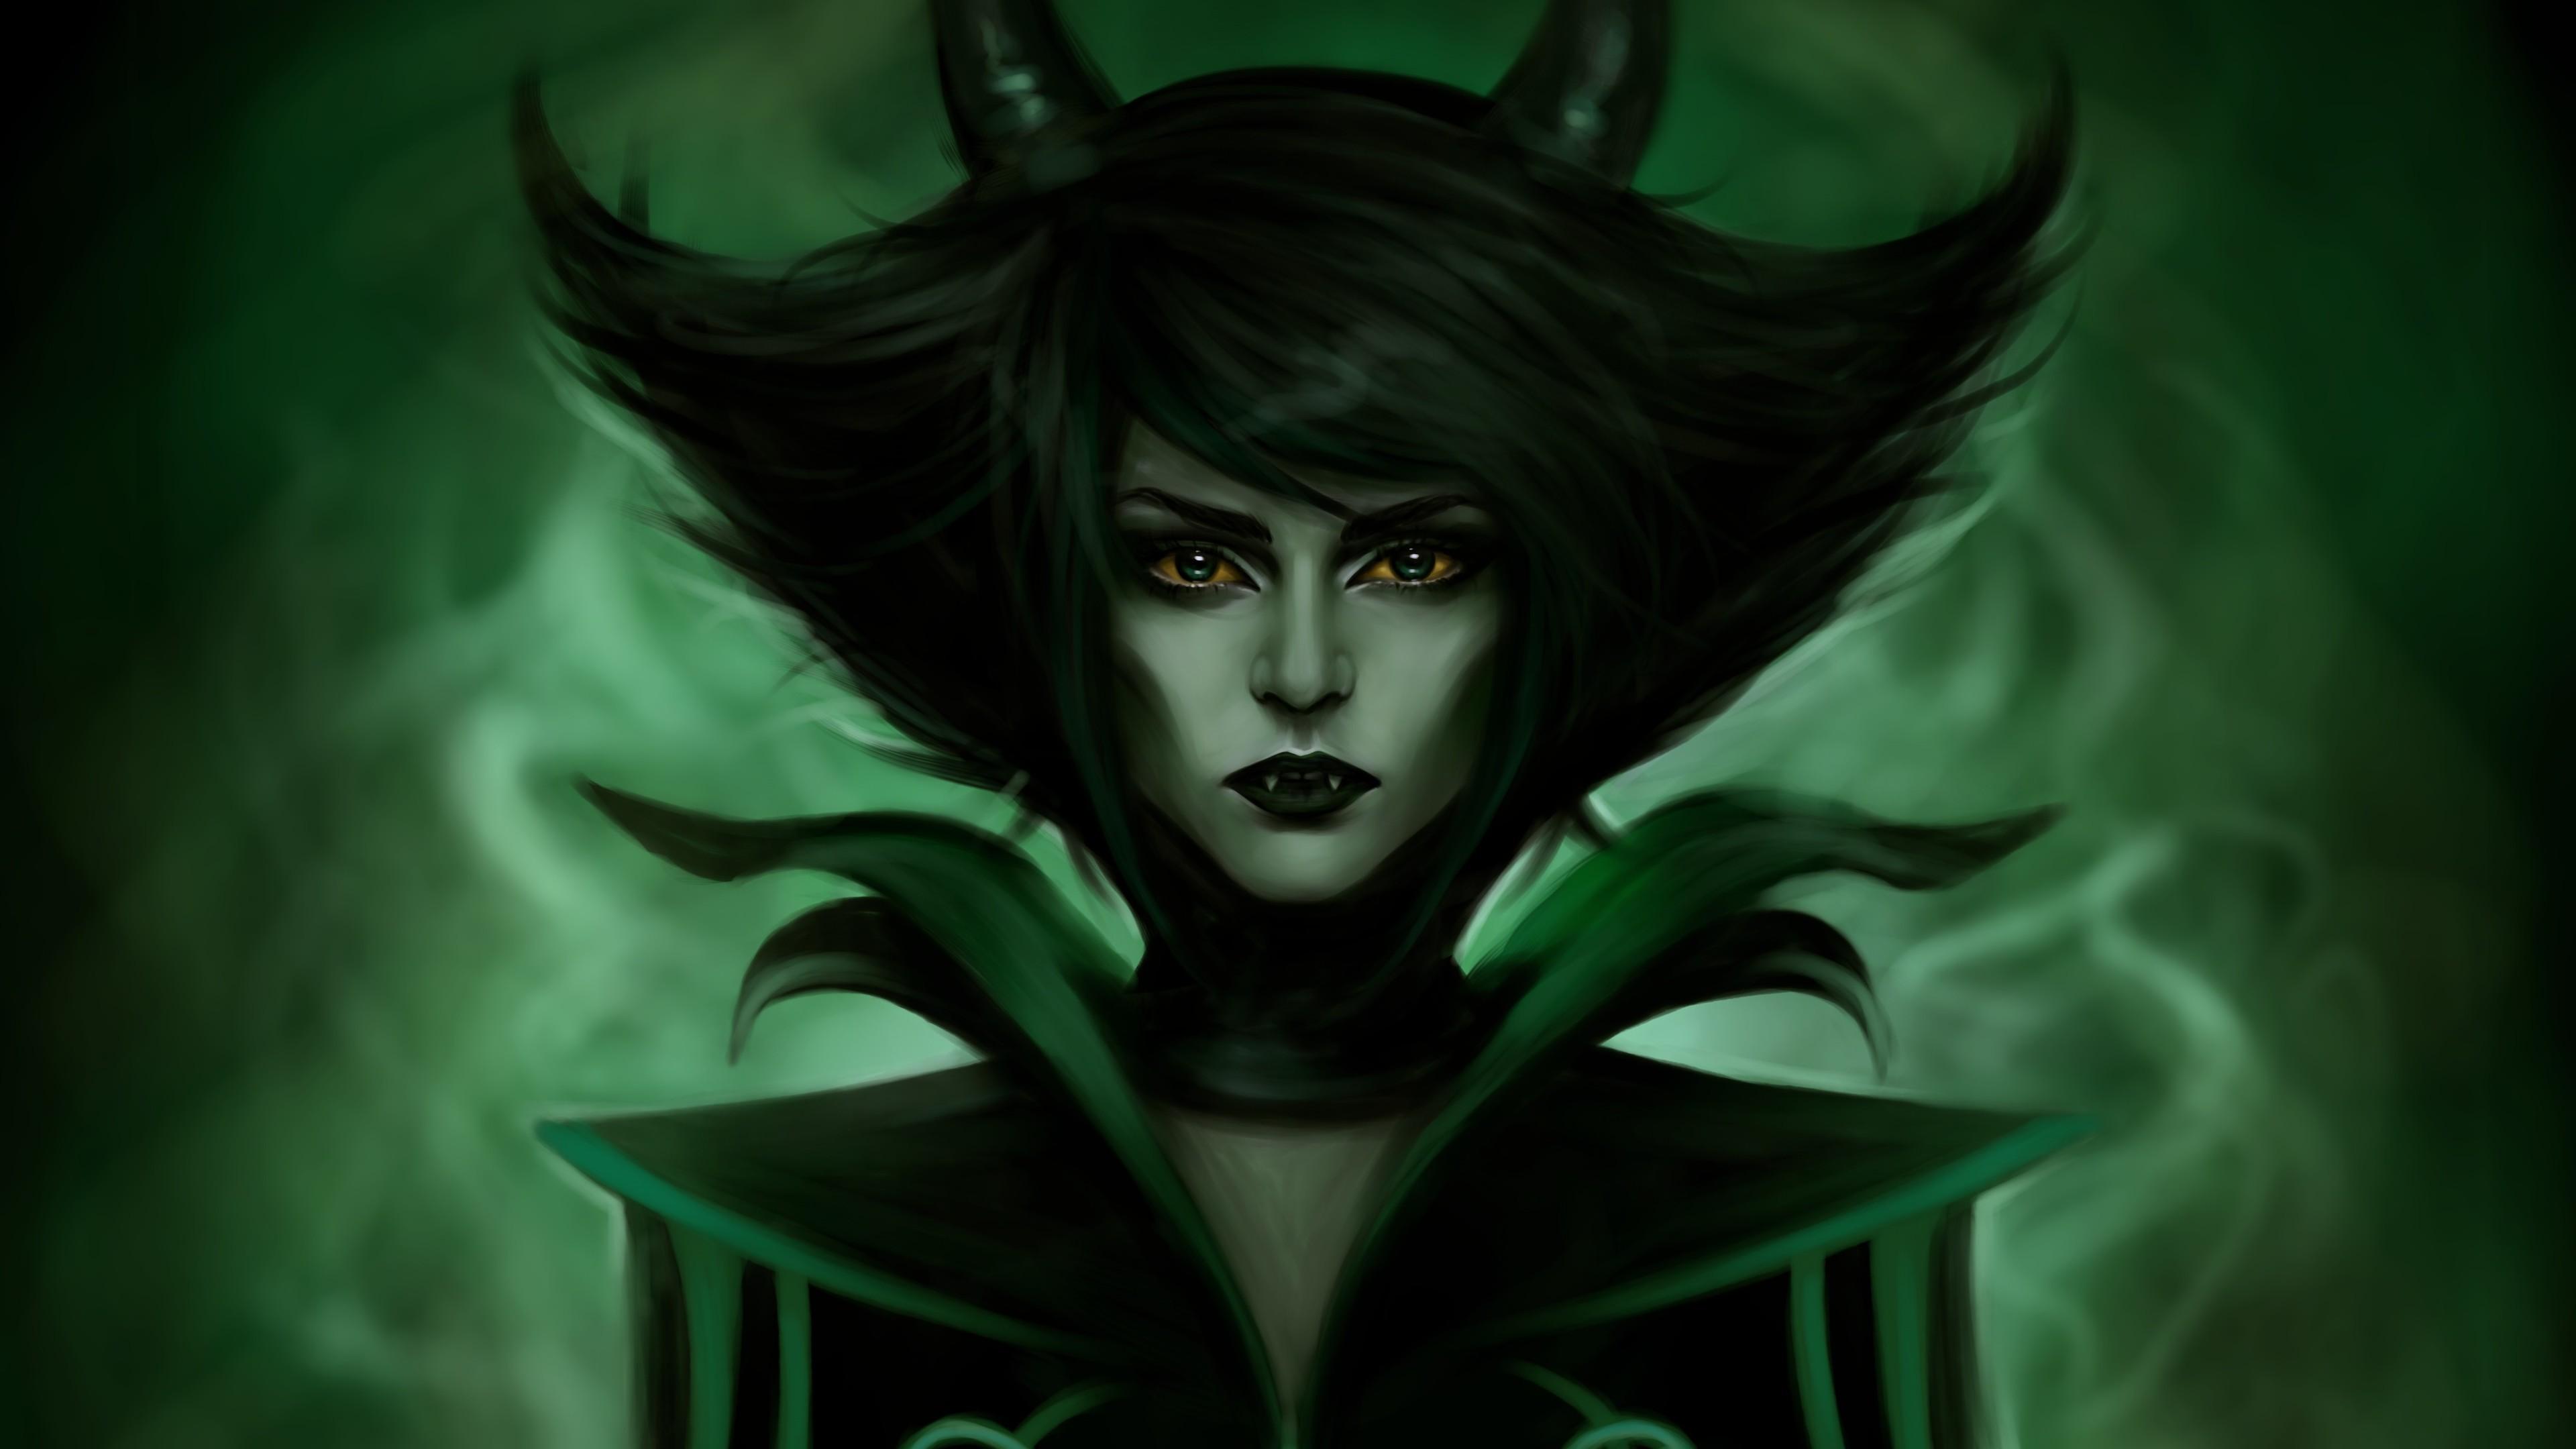 demon fantasy green horns 4k 1540750315 - Demon Fantasy Green Horns 4k - horns wallpapers, hd-wallpapers, fantasy wallpapers, digital art wallpapers, demon wallpapers, artwork wallpapers, artist wallpapers, 5k wallpapers, 4k-wallpapers